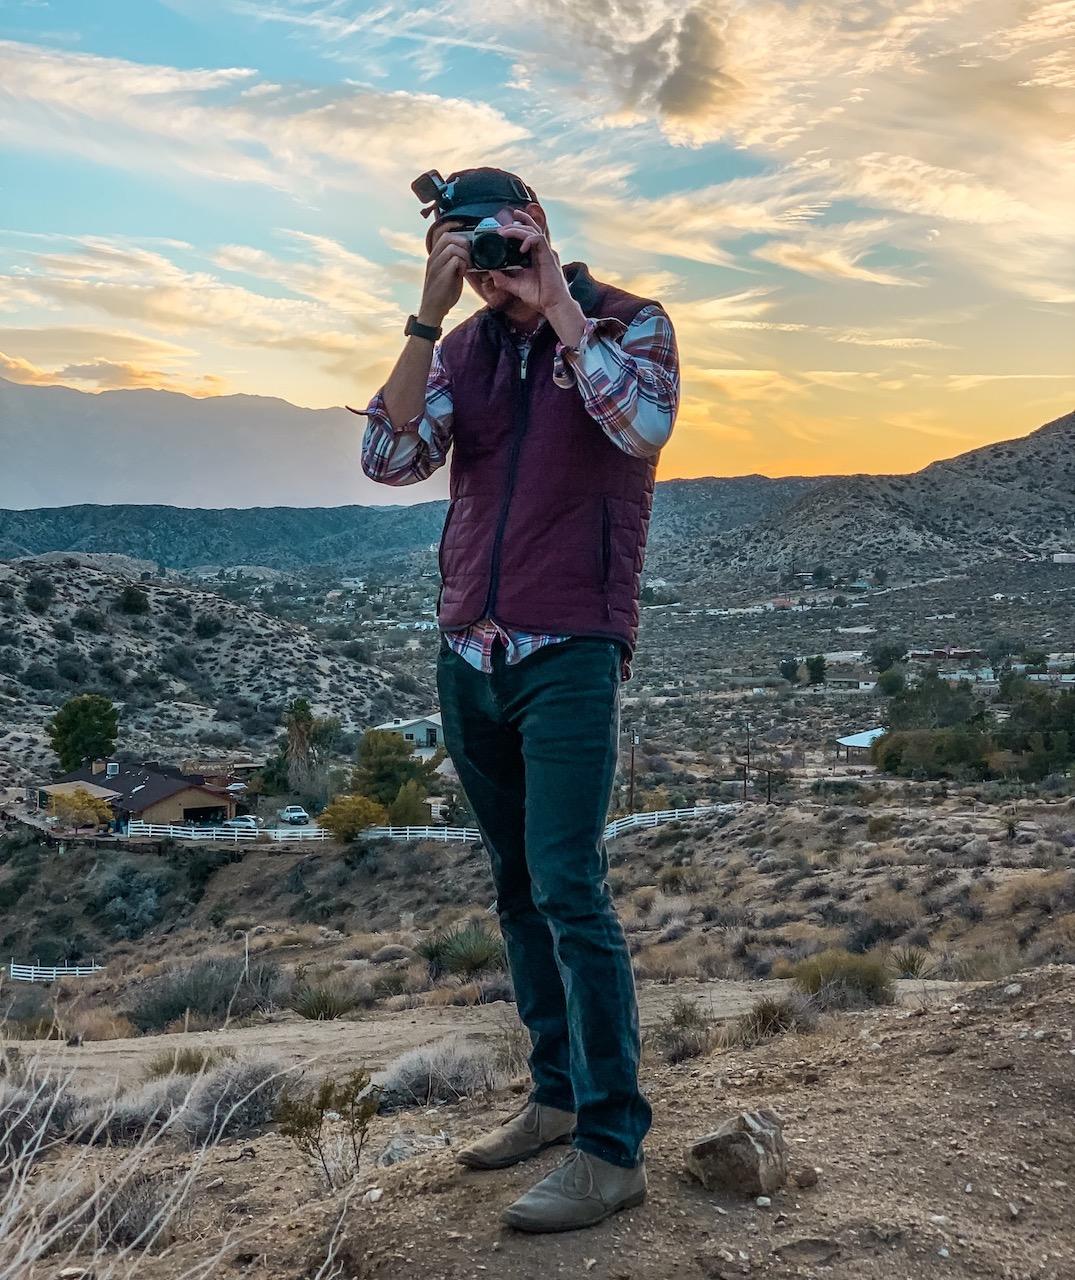 Shawn-Desert-Portrait-4.JPG